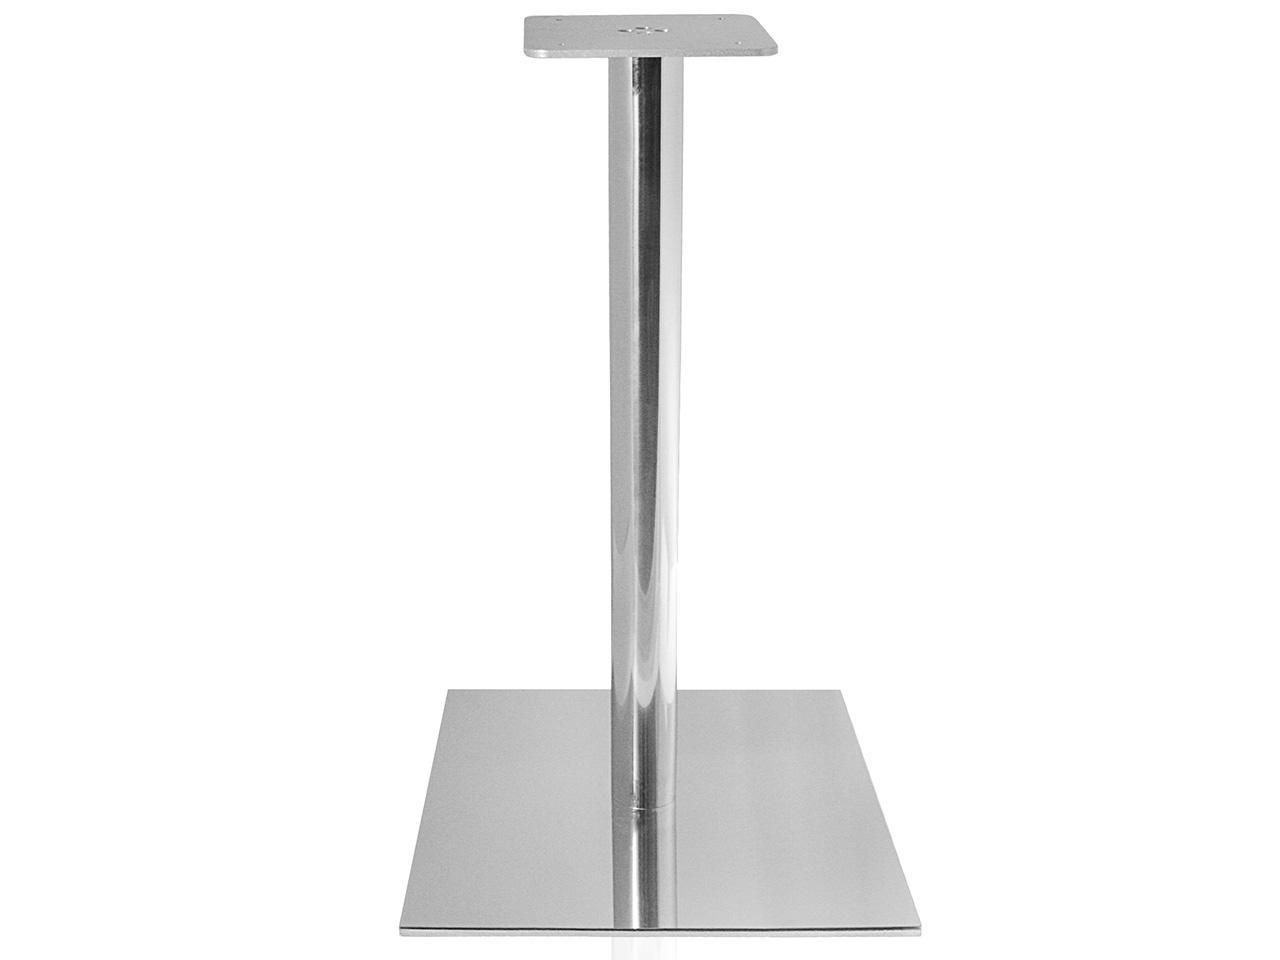 Подстолье металлическое РКС-001400 Stainless steel